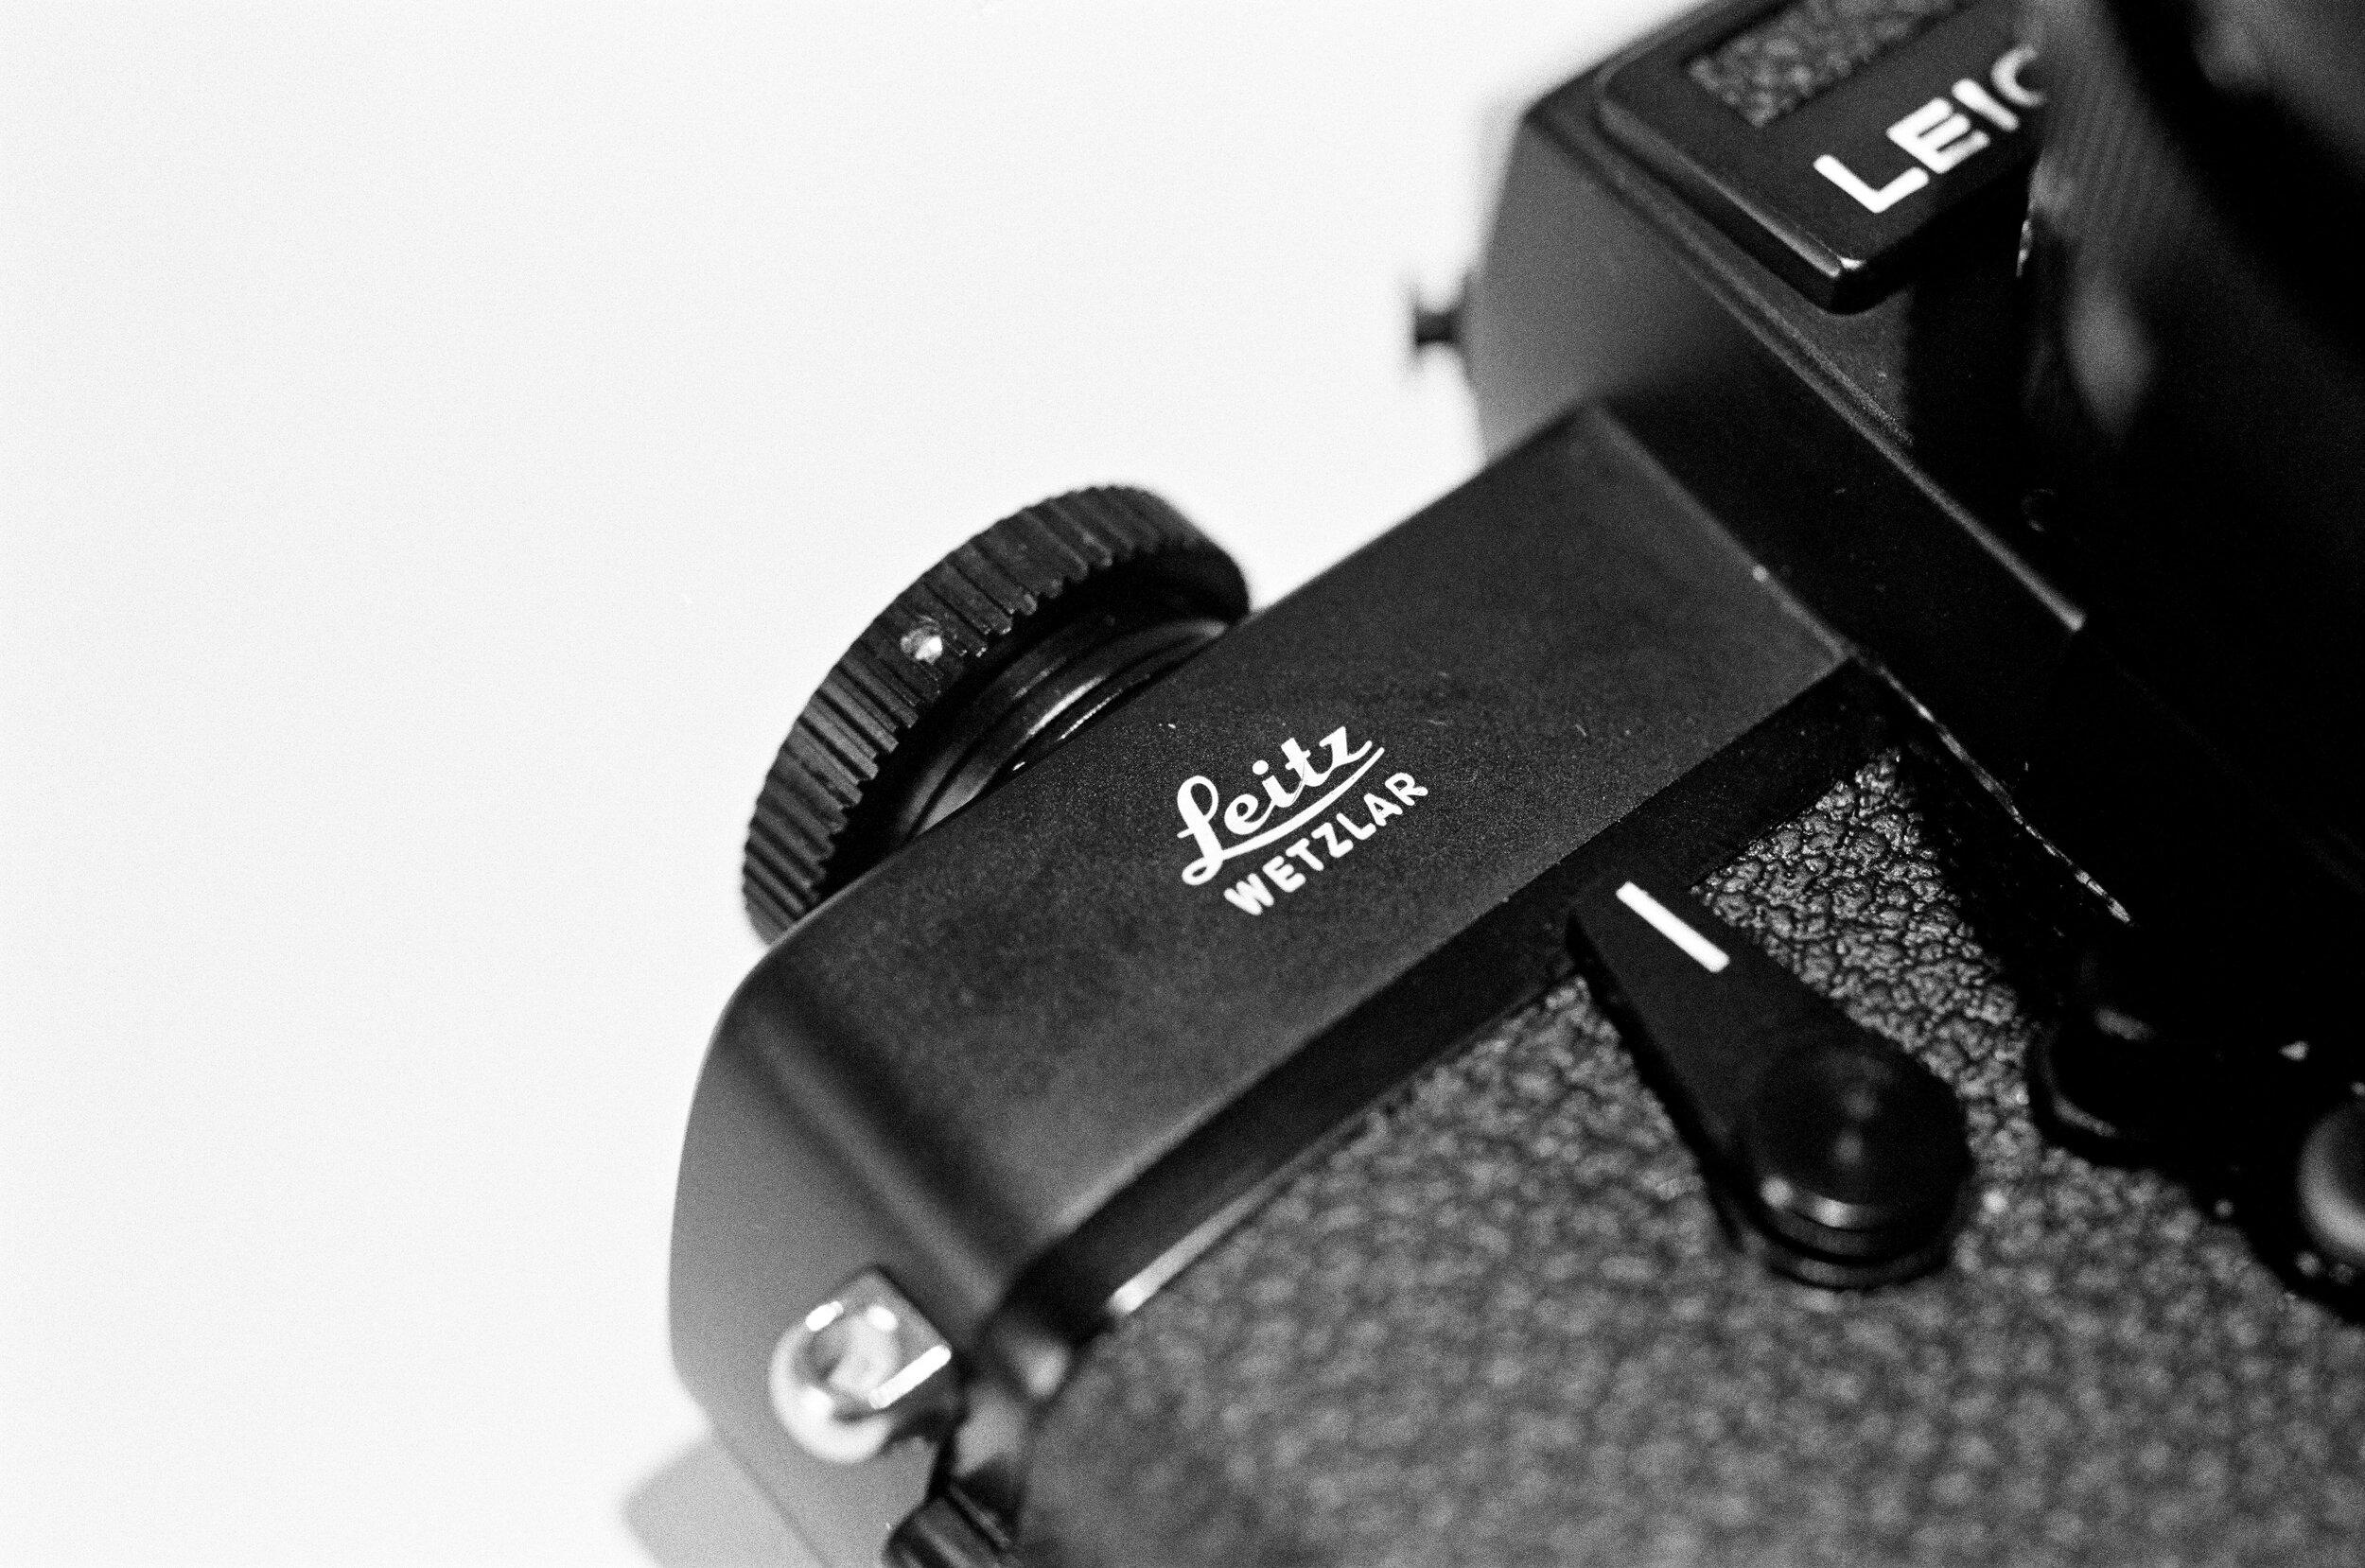 Leicaflex SL2.jpg